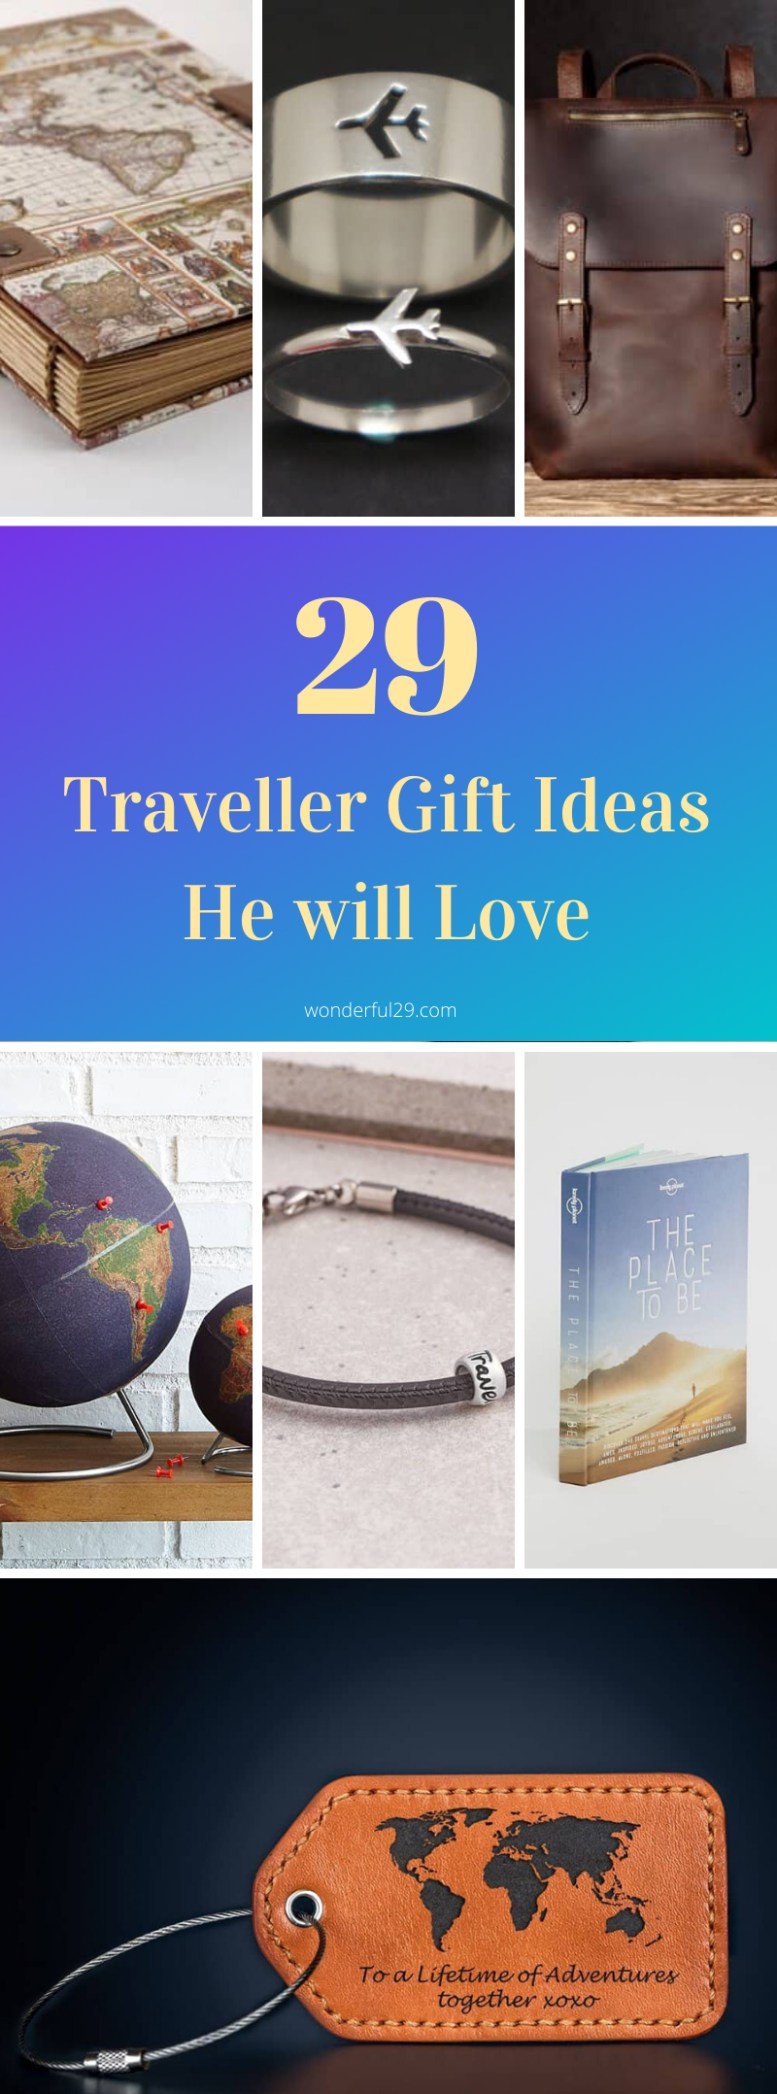 Traveller Gifts for Him